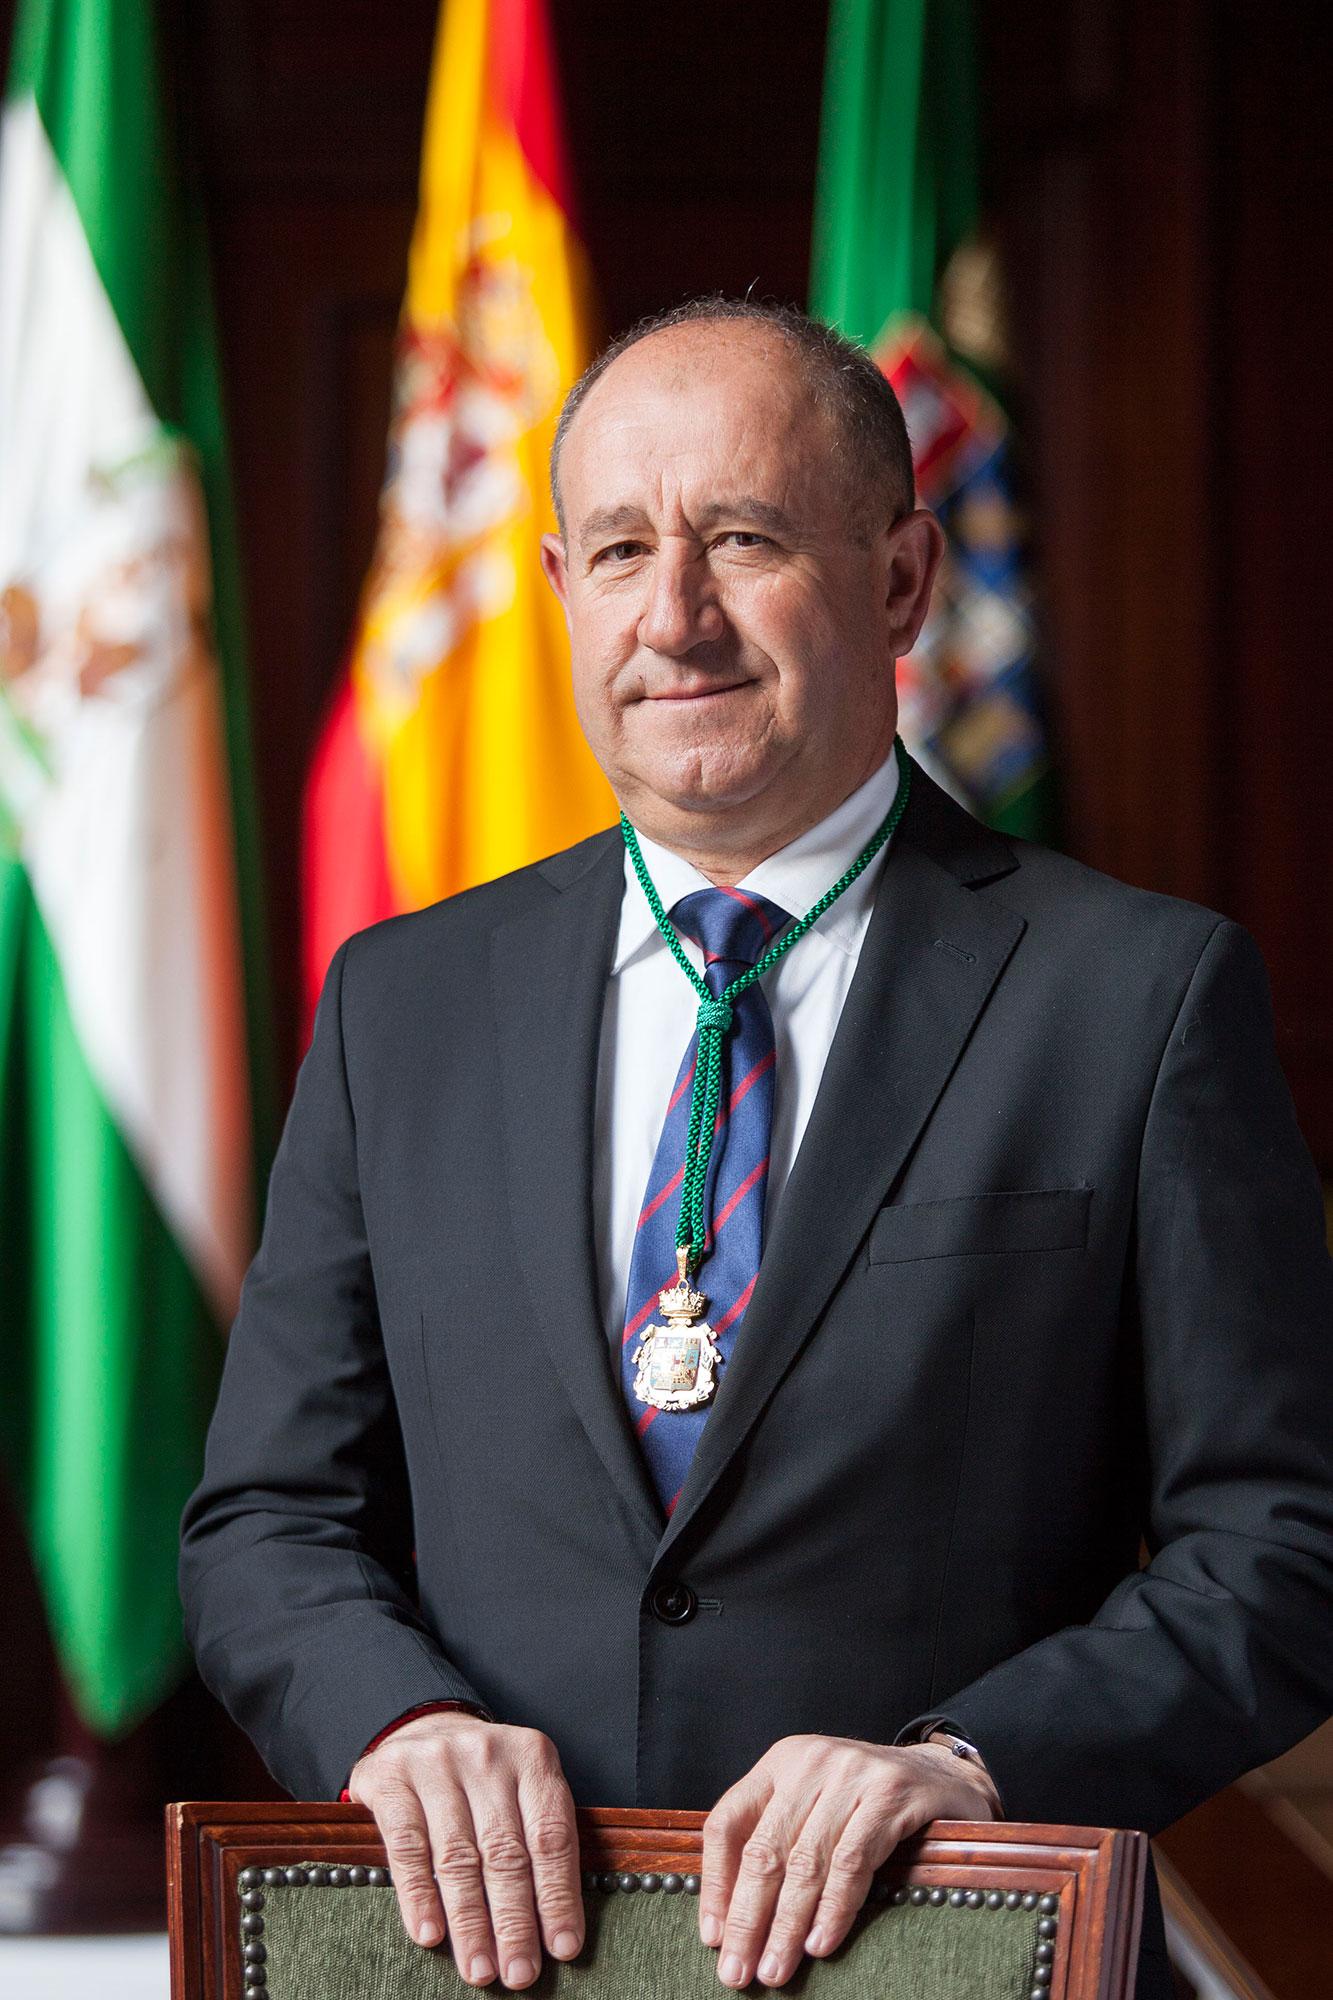 Antonio Torres Ruiz